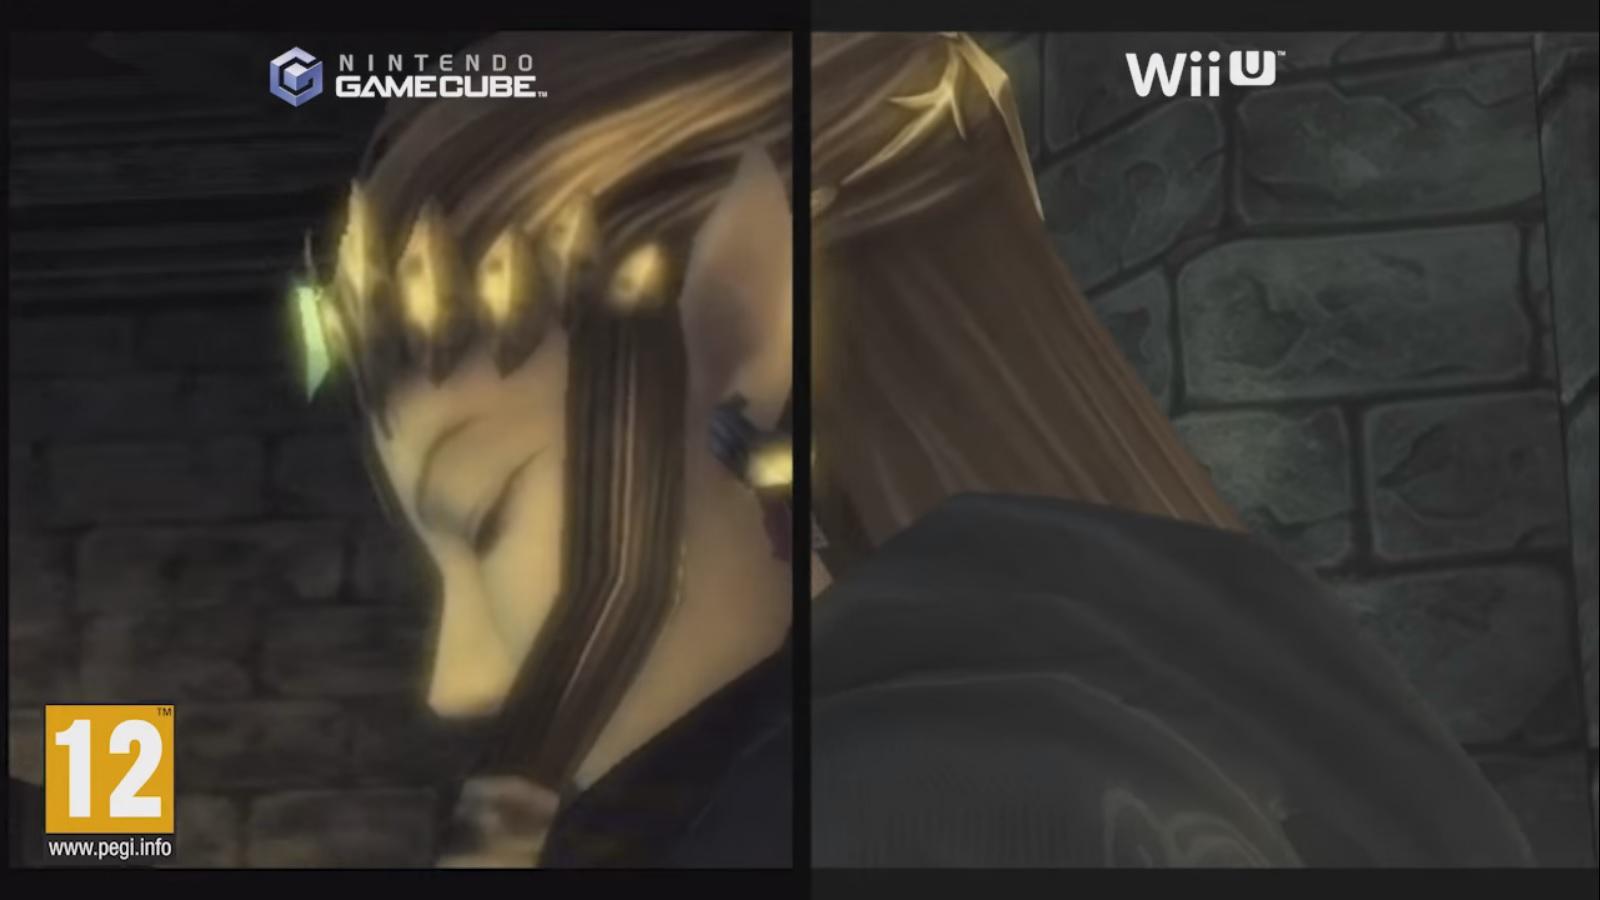 zelda twilight princess hd gamecube and wii u comparison from